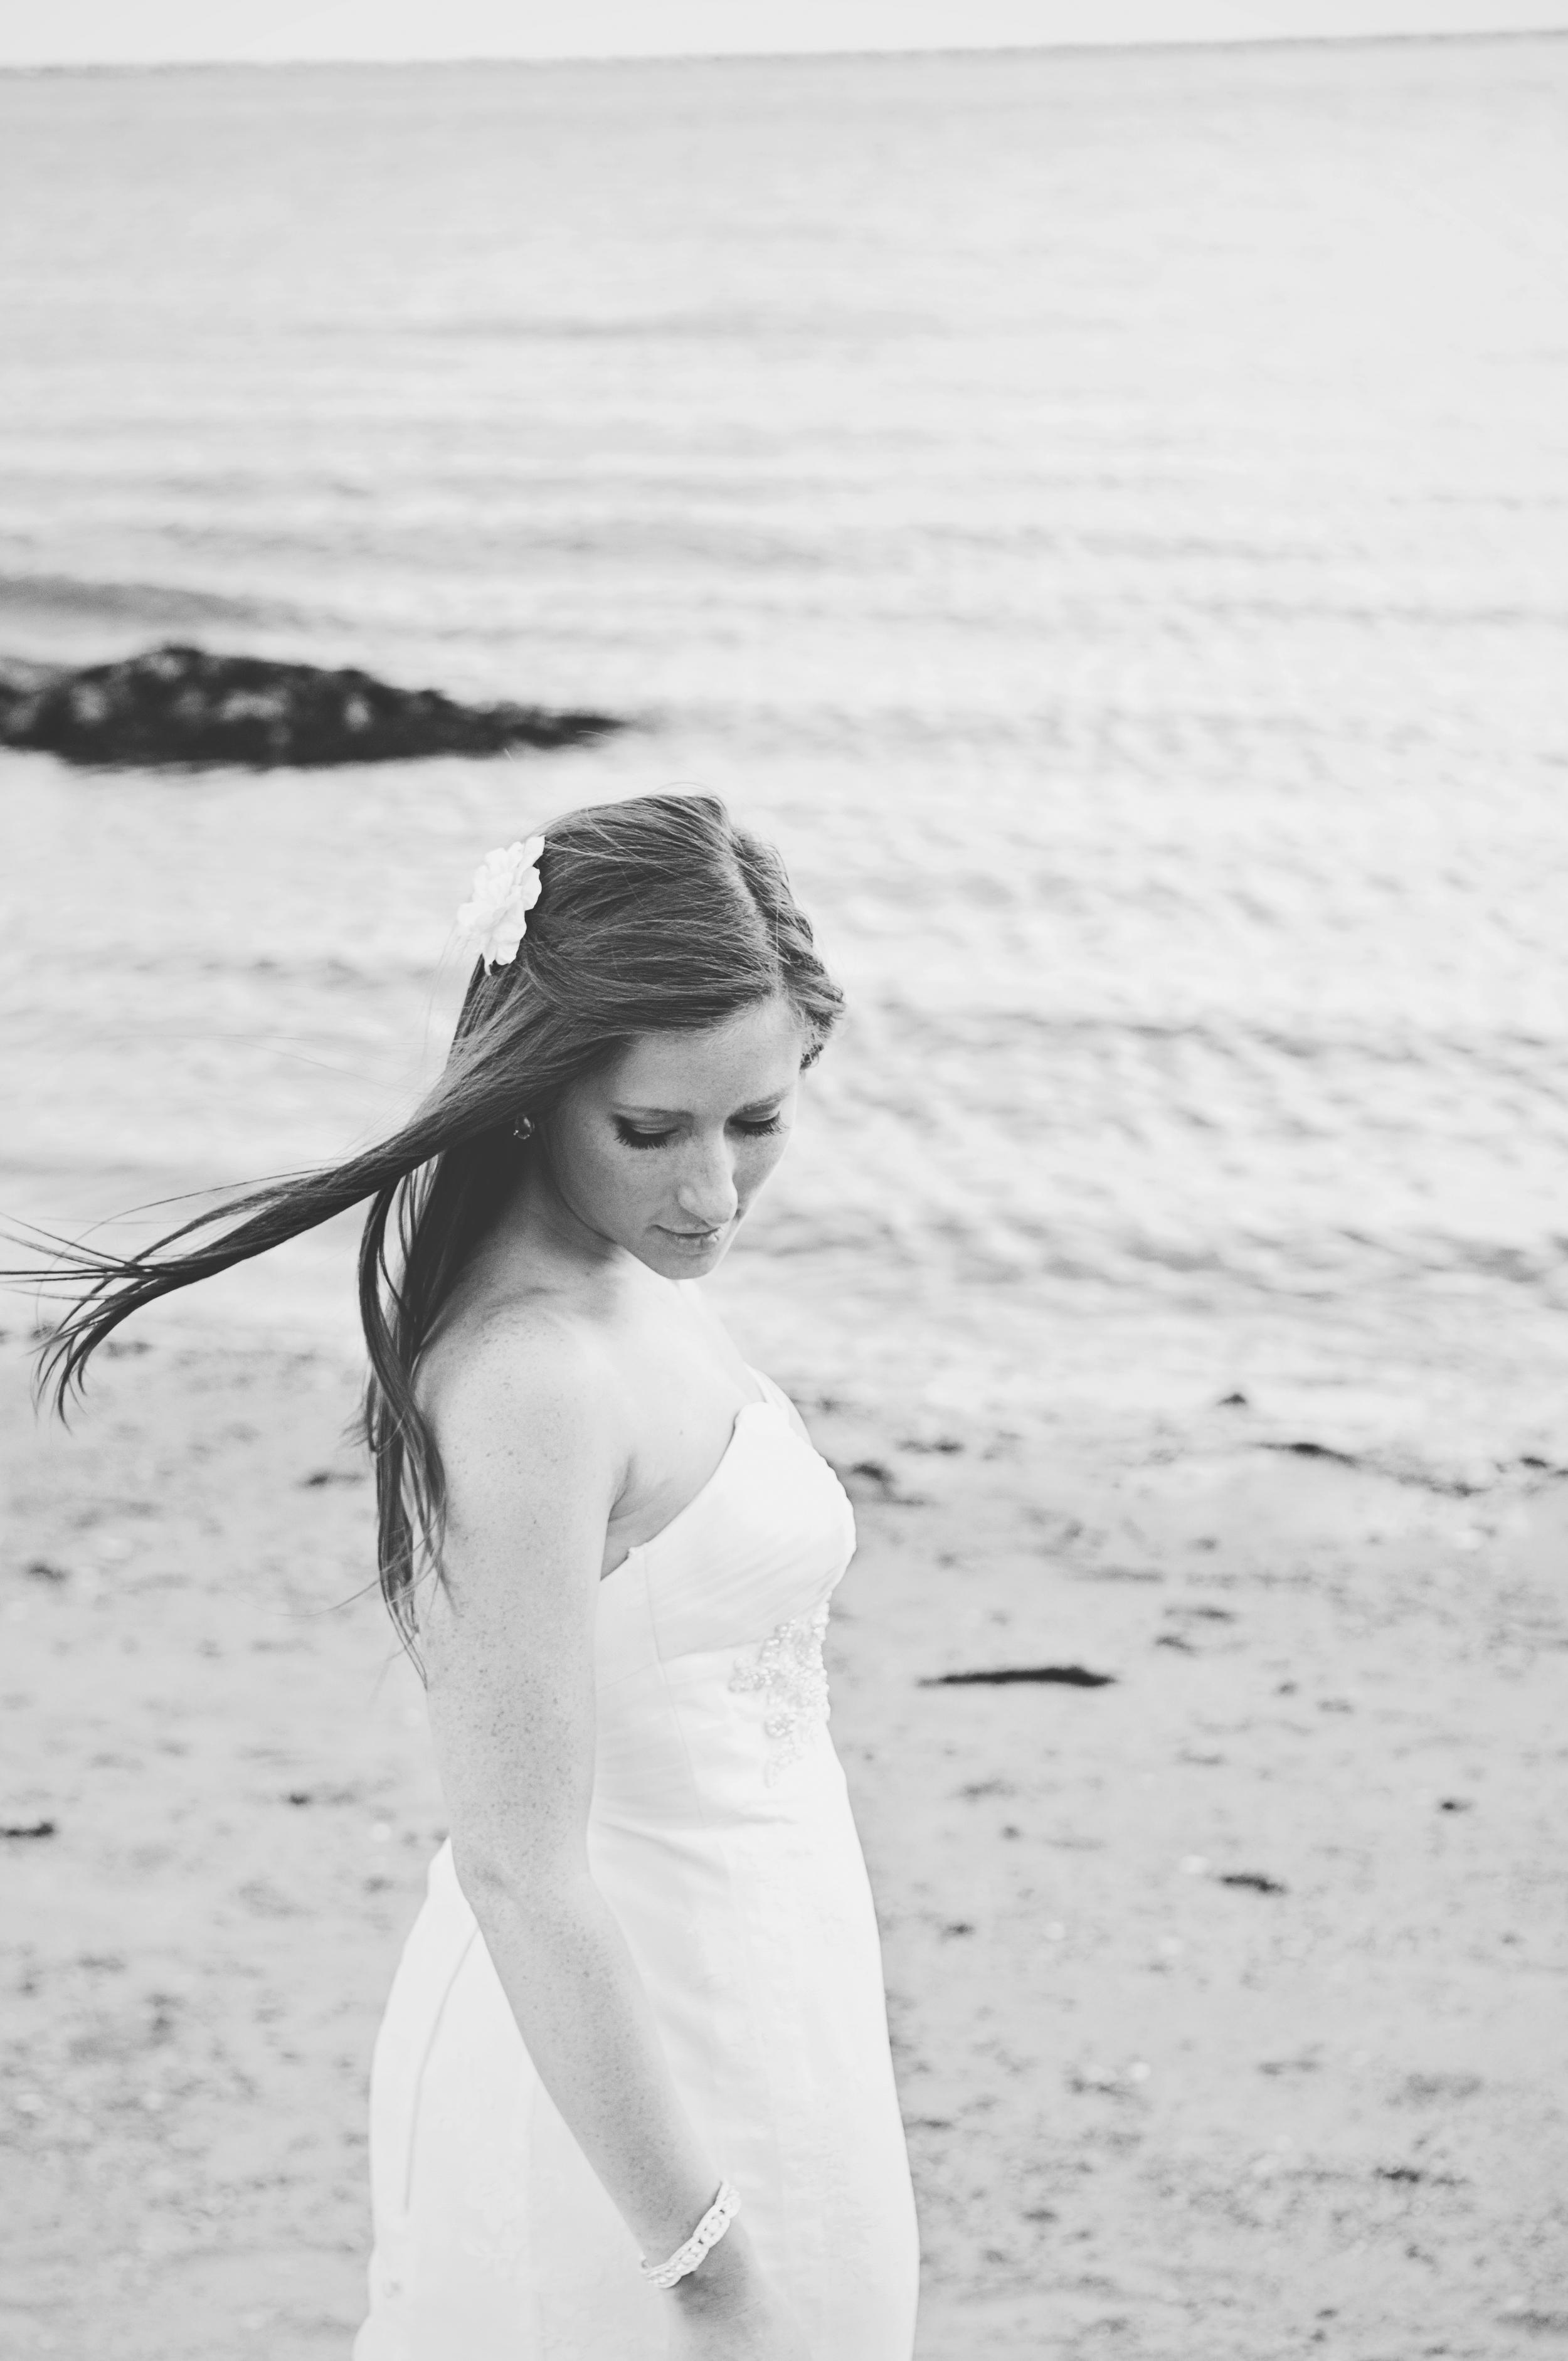 Angela_Chicoski_CT_wedding_photographer_067.jpg